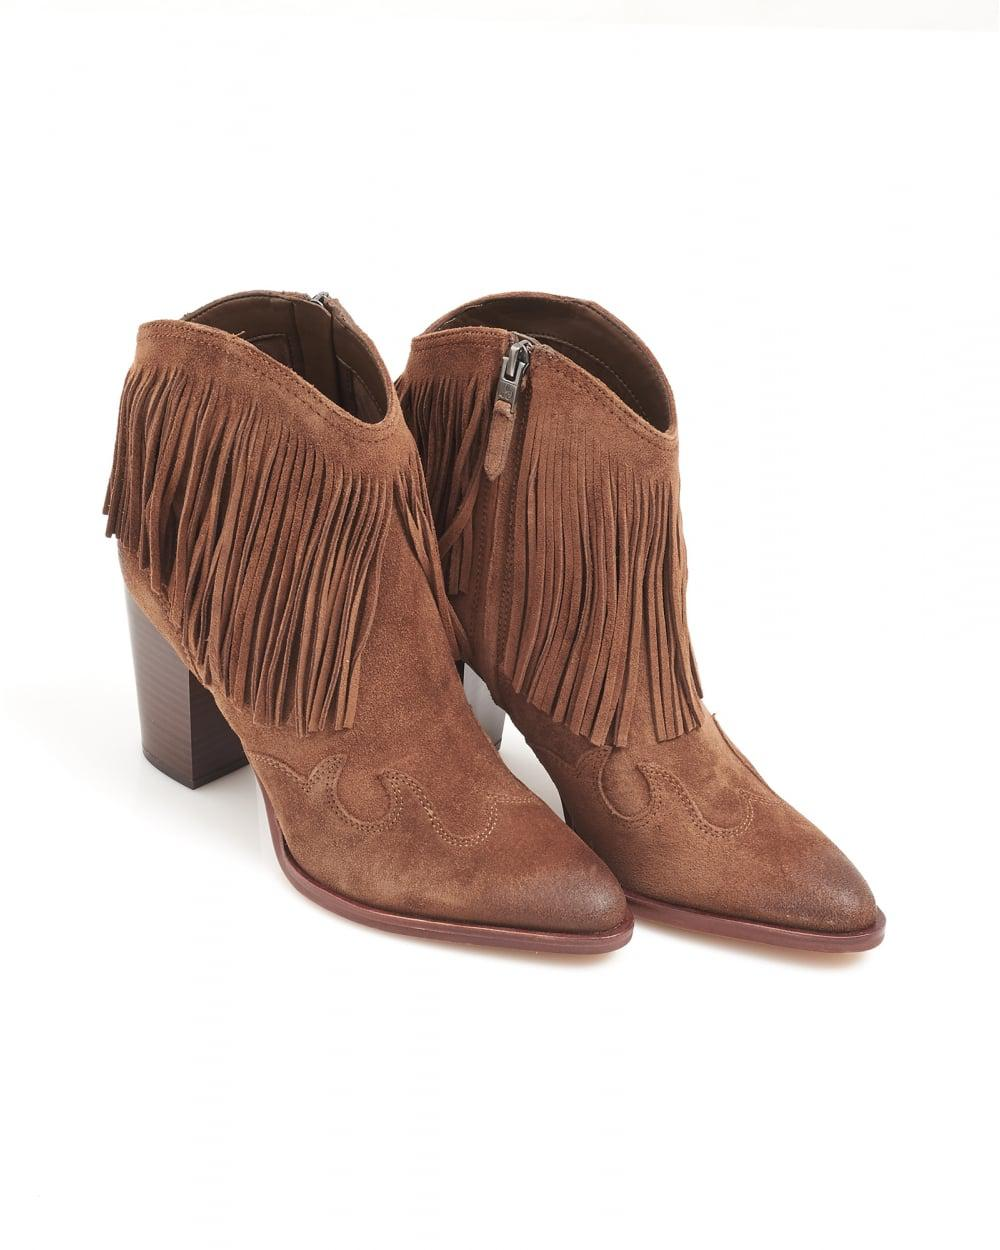 7c515a950 Sam Edelman Benjie Shoes